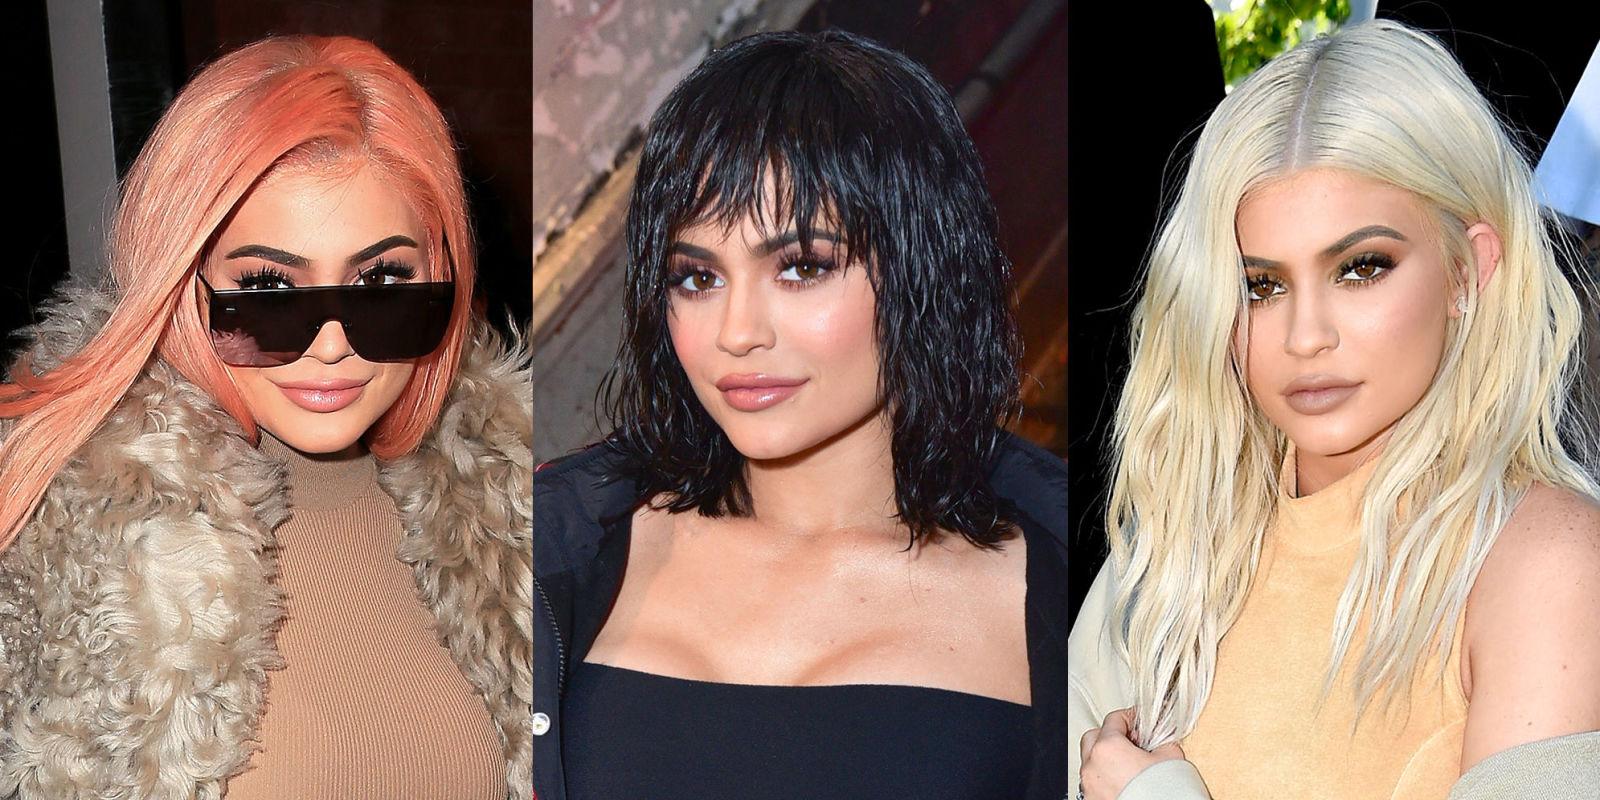 Hairstyles Kylie Jenner: 50 Best Kylie Jenner Hair Looks